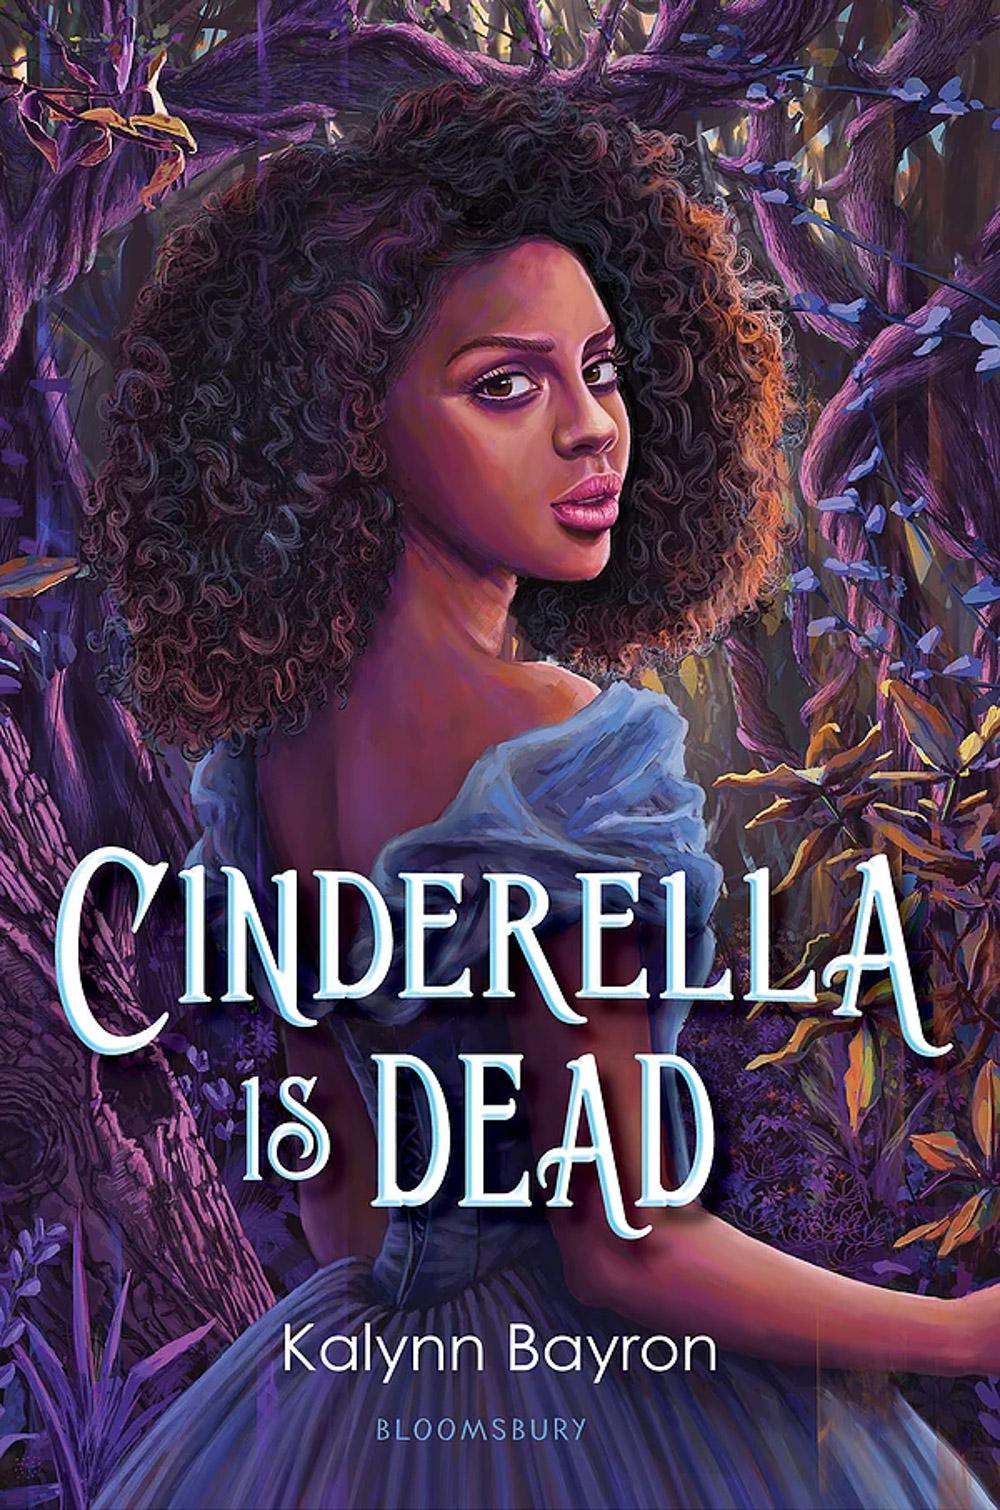 Cinderella is D e a d by Kaylynn Bayron